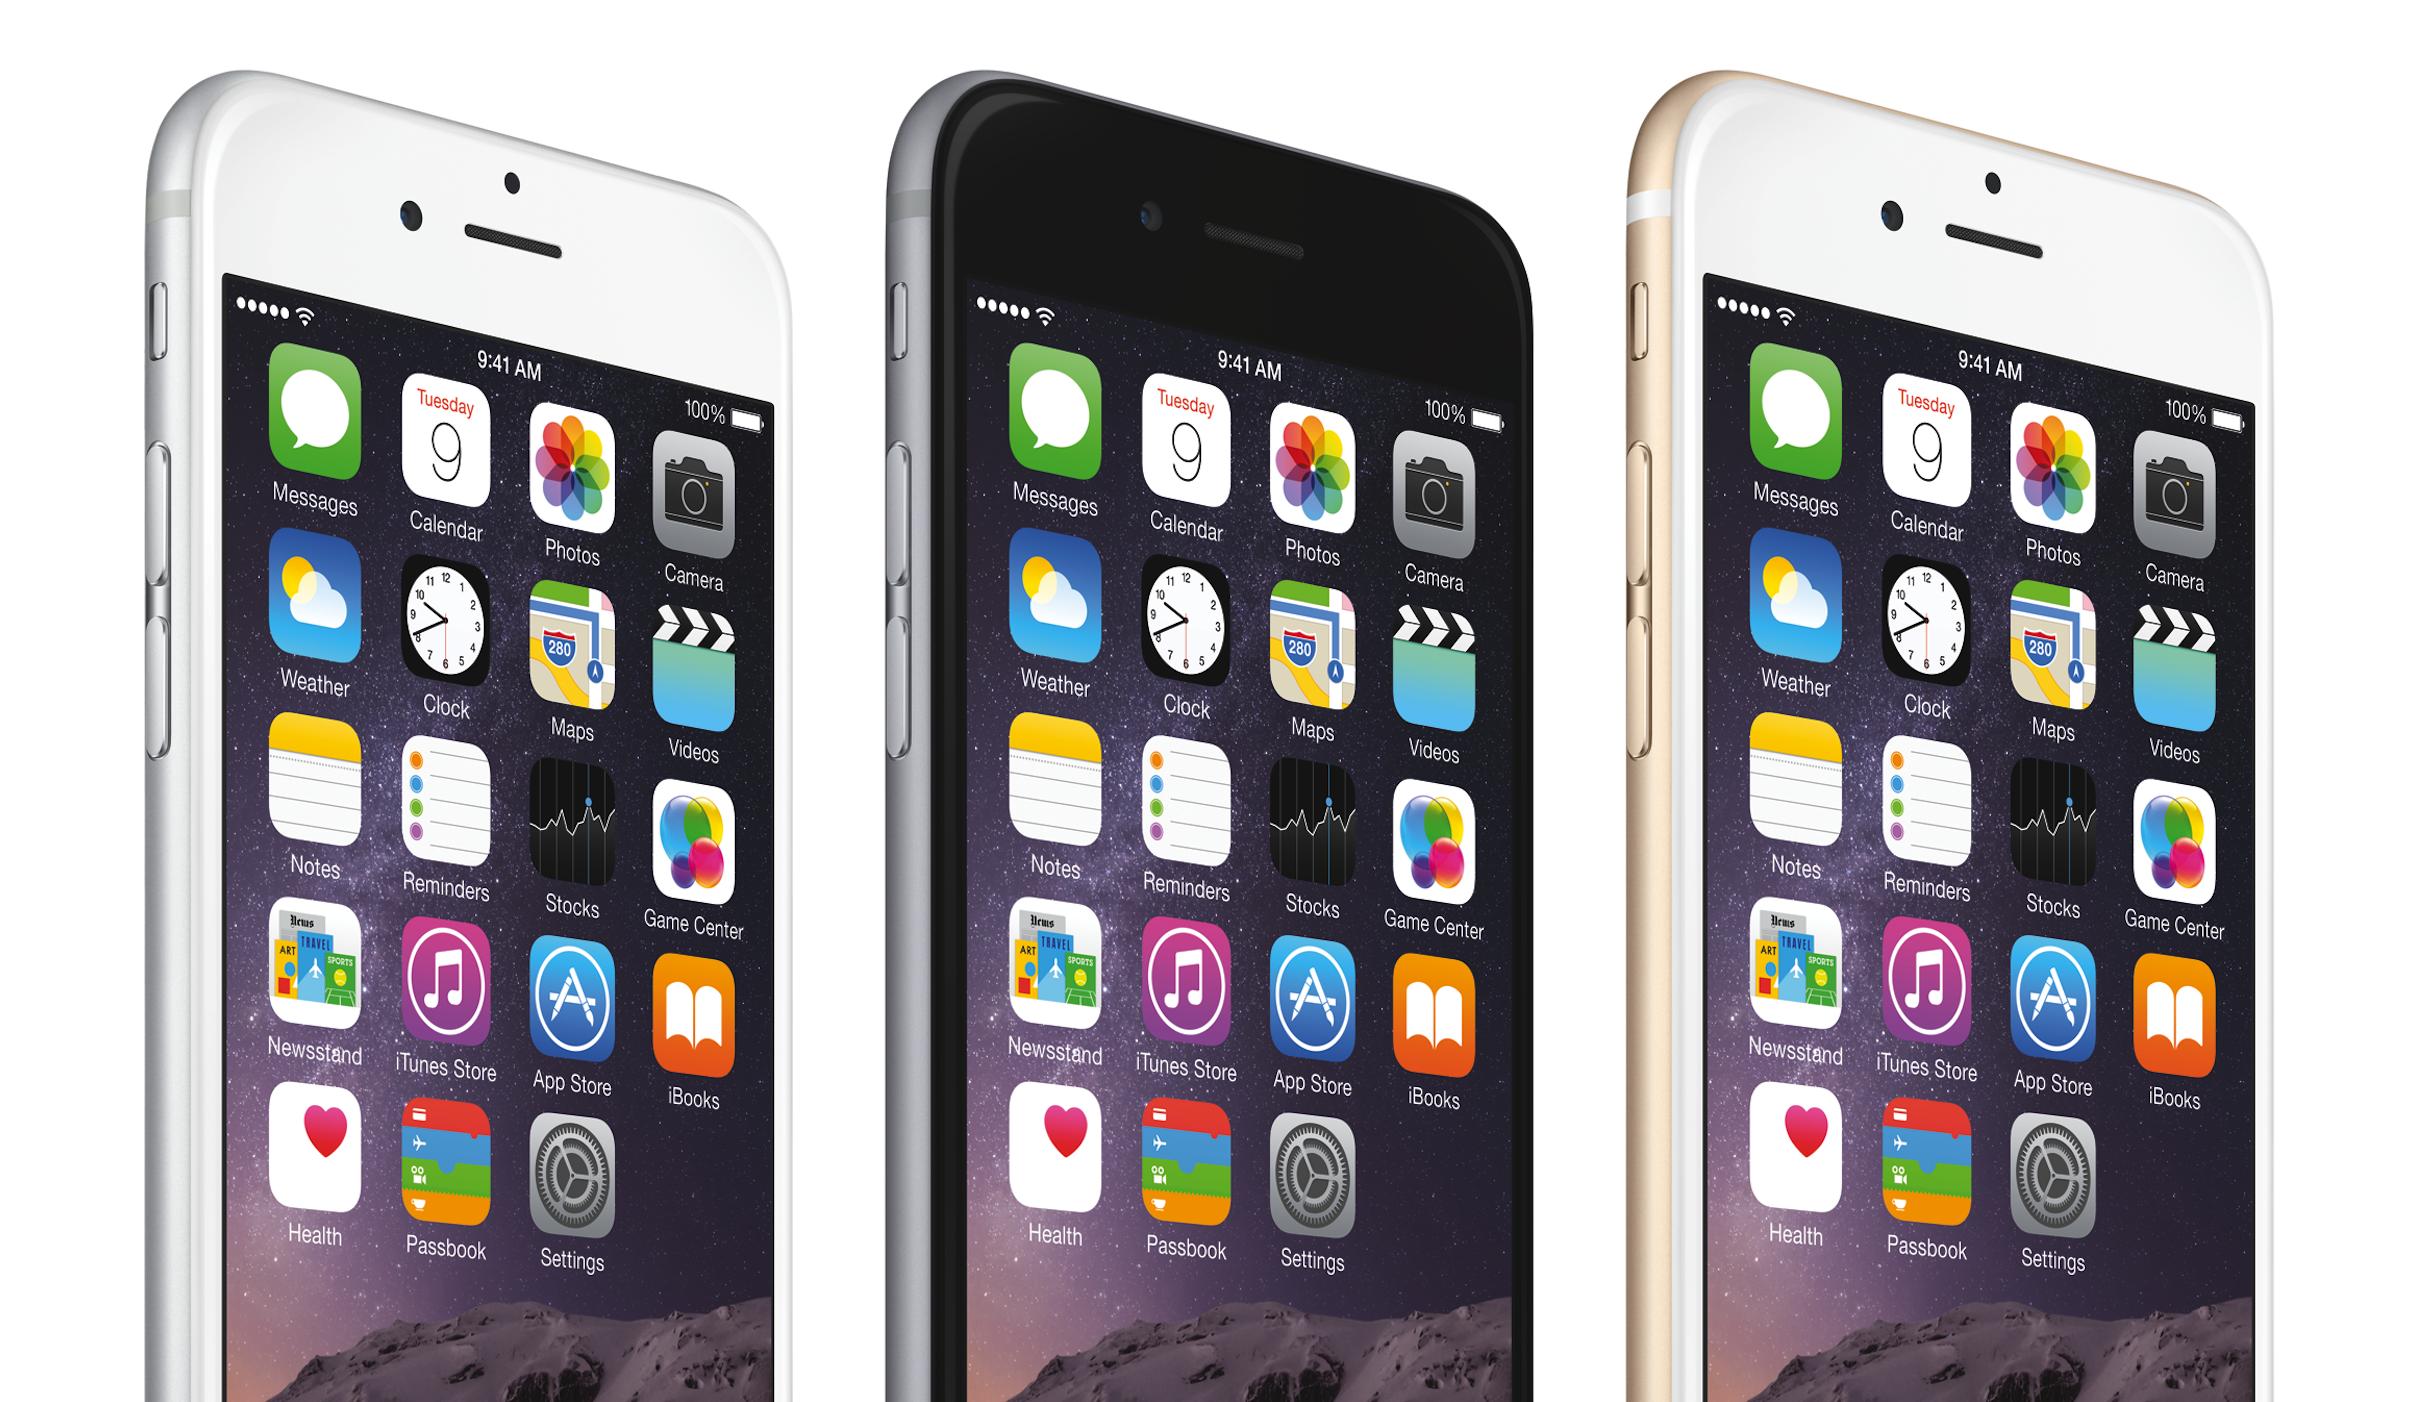 Предзаказы на Phone 6S/6S Plus побили прошлогодний рекорд